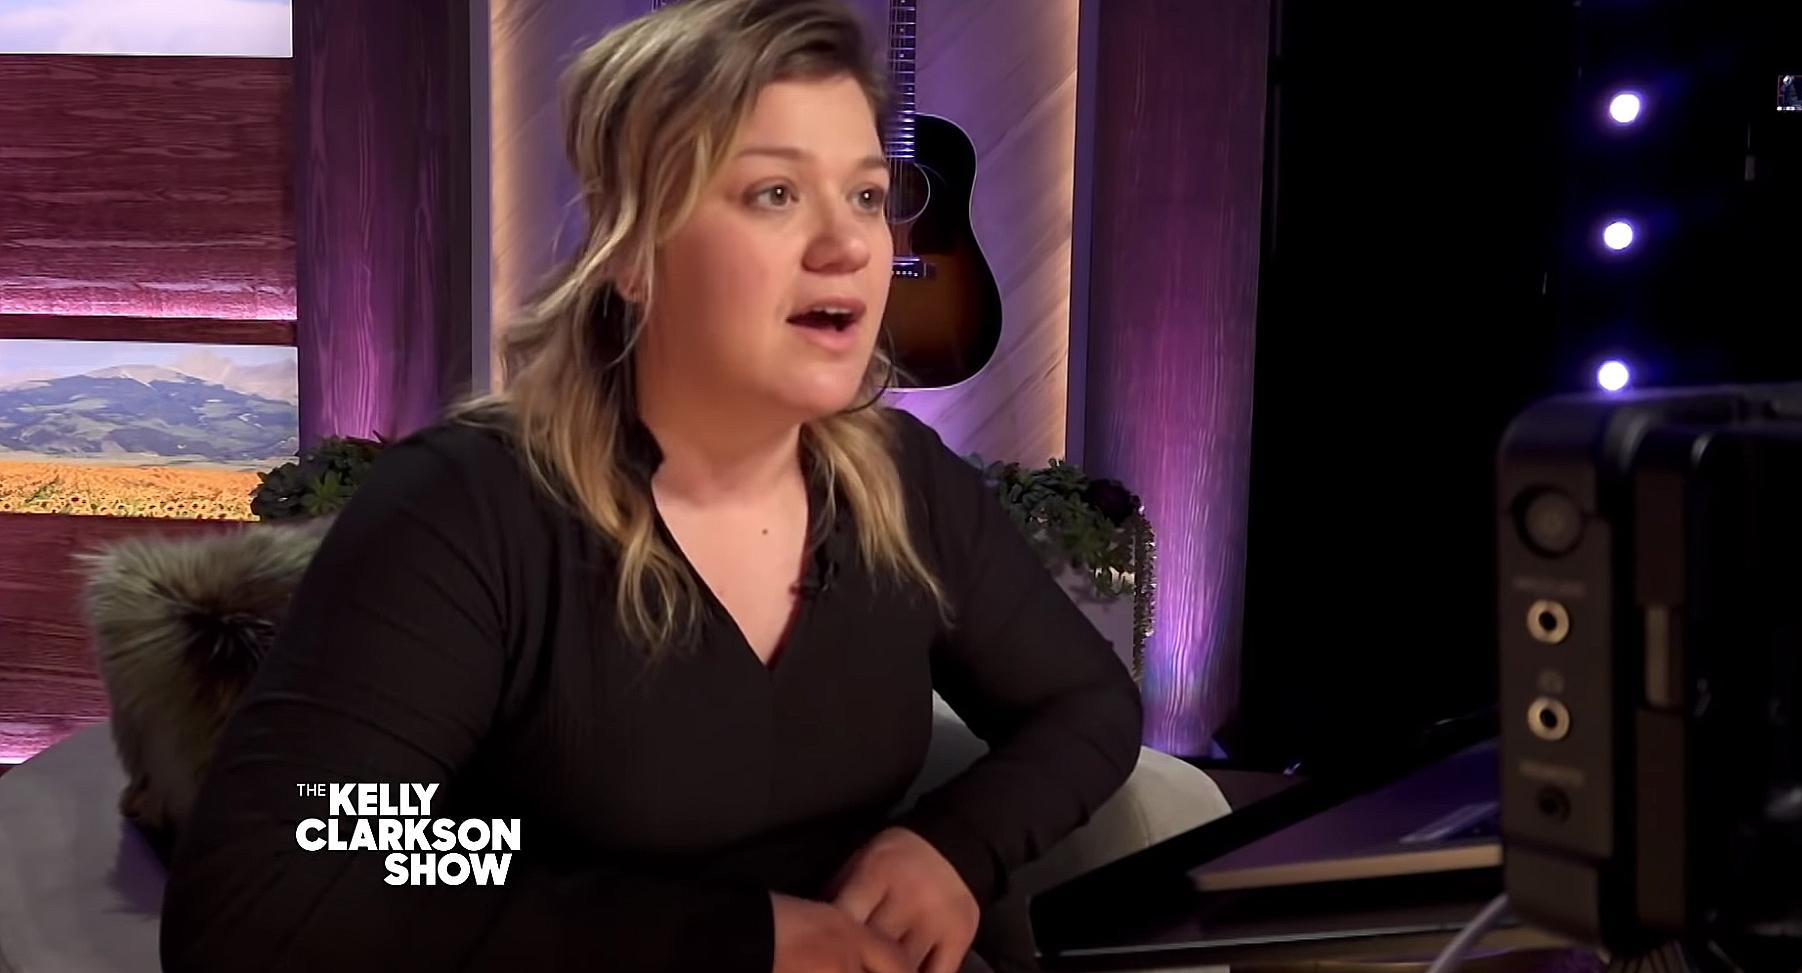 Kelly Clarkson not wearing wedding ring